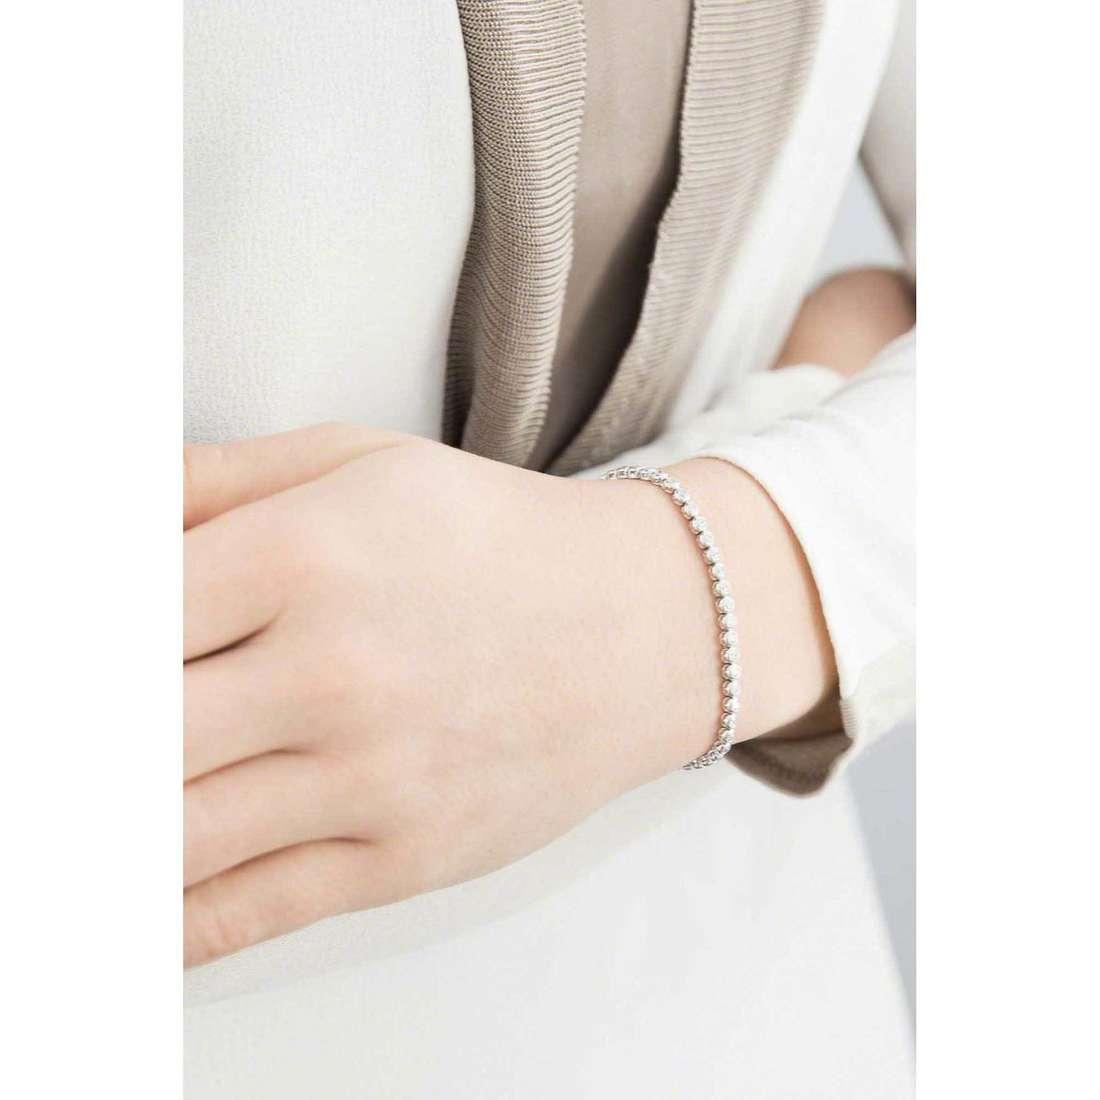 GioiaPura bracelets woman 19865-01-16 indosso